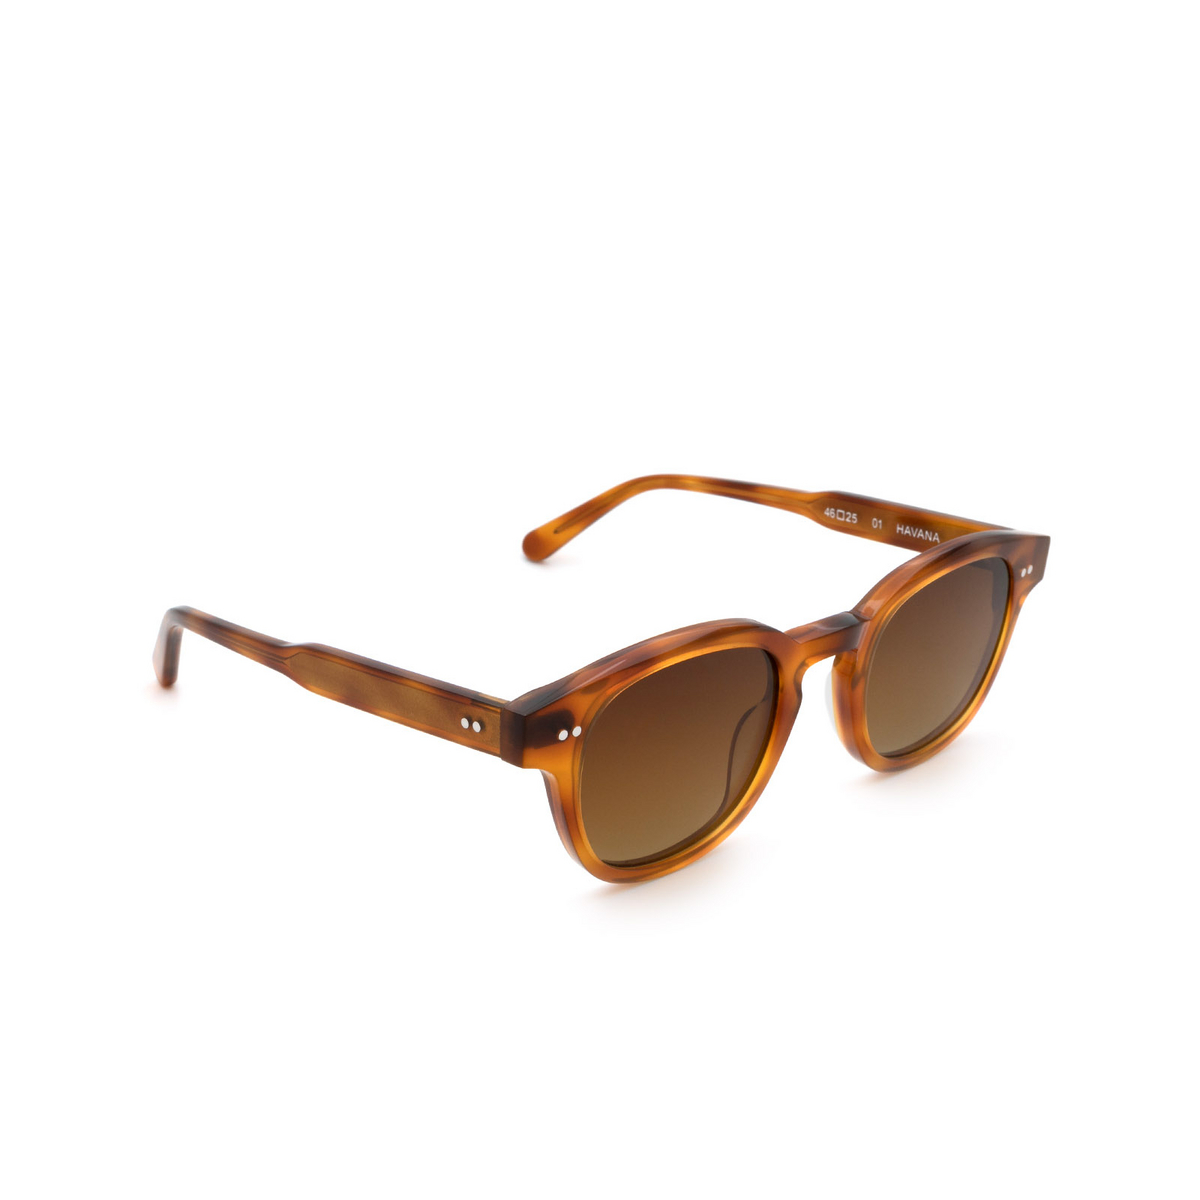 Chimi® Square Sunglasses: 01 color Havana - three-quarters view.